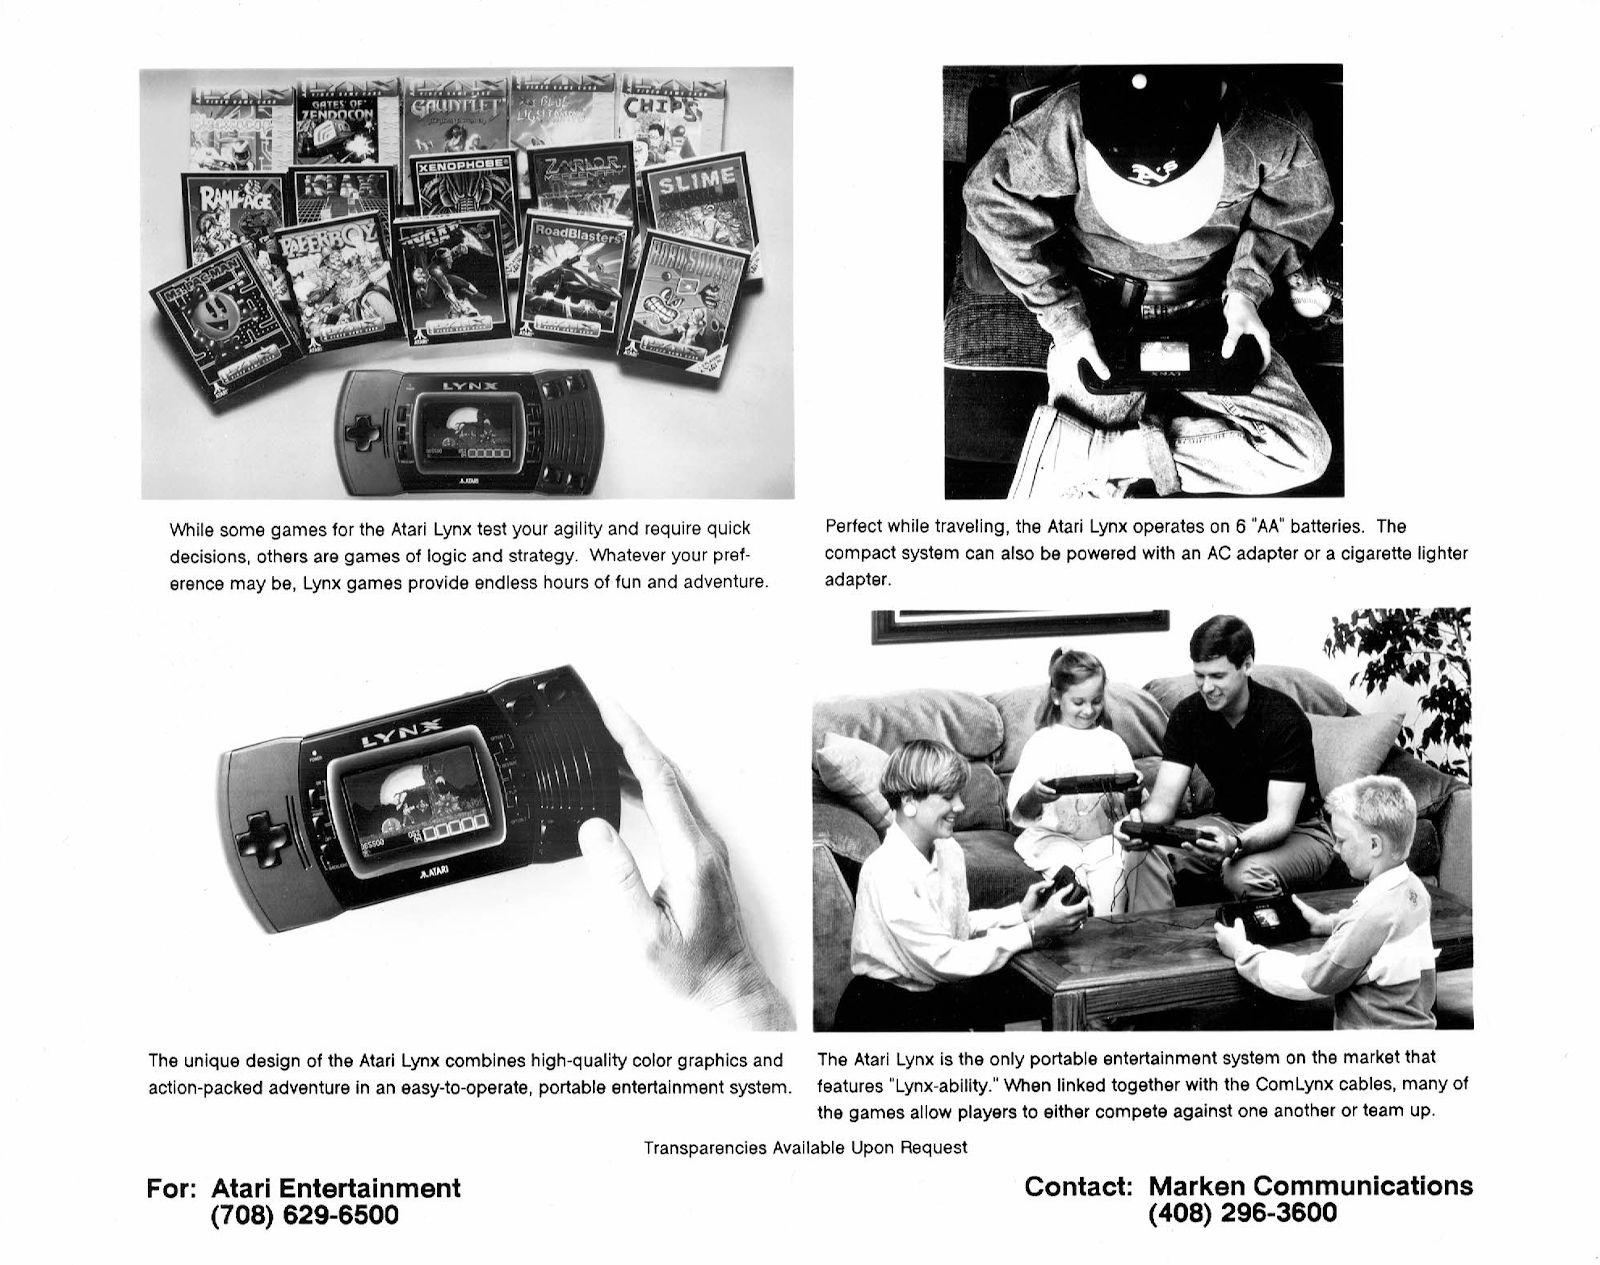 US-amerikanisches Pressematerial zum Atari Lynx. (Bild: Stephan Freundorfer)